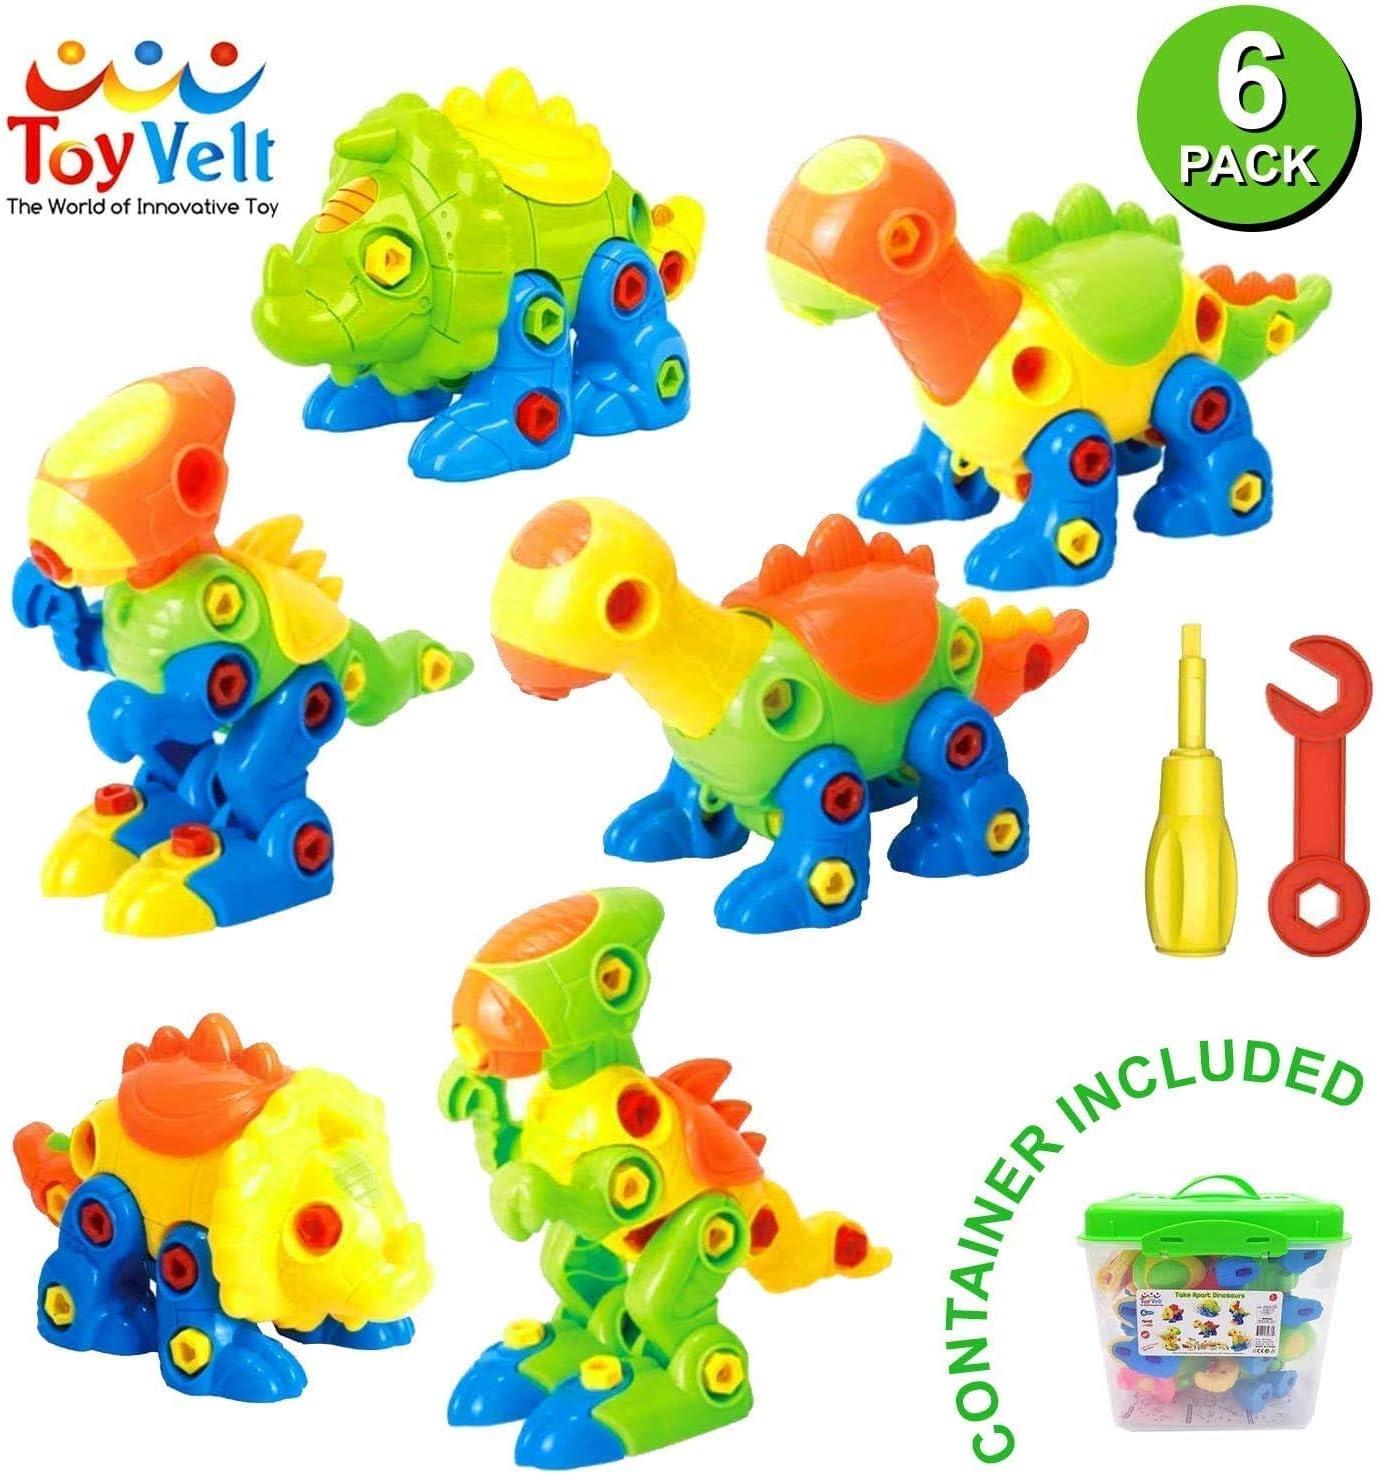 218 piec Dinosaur Take Apart Stem Toys for Boys /& Girls Age 3-12 years old